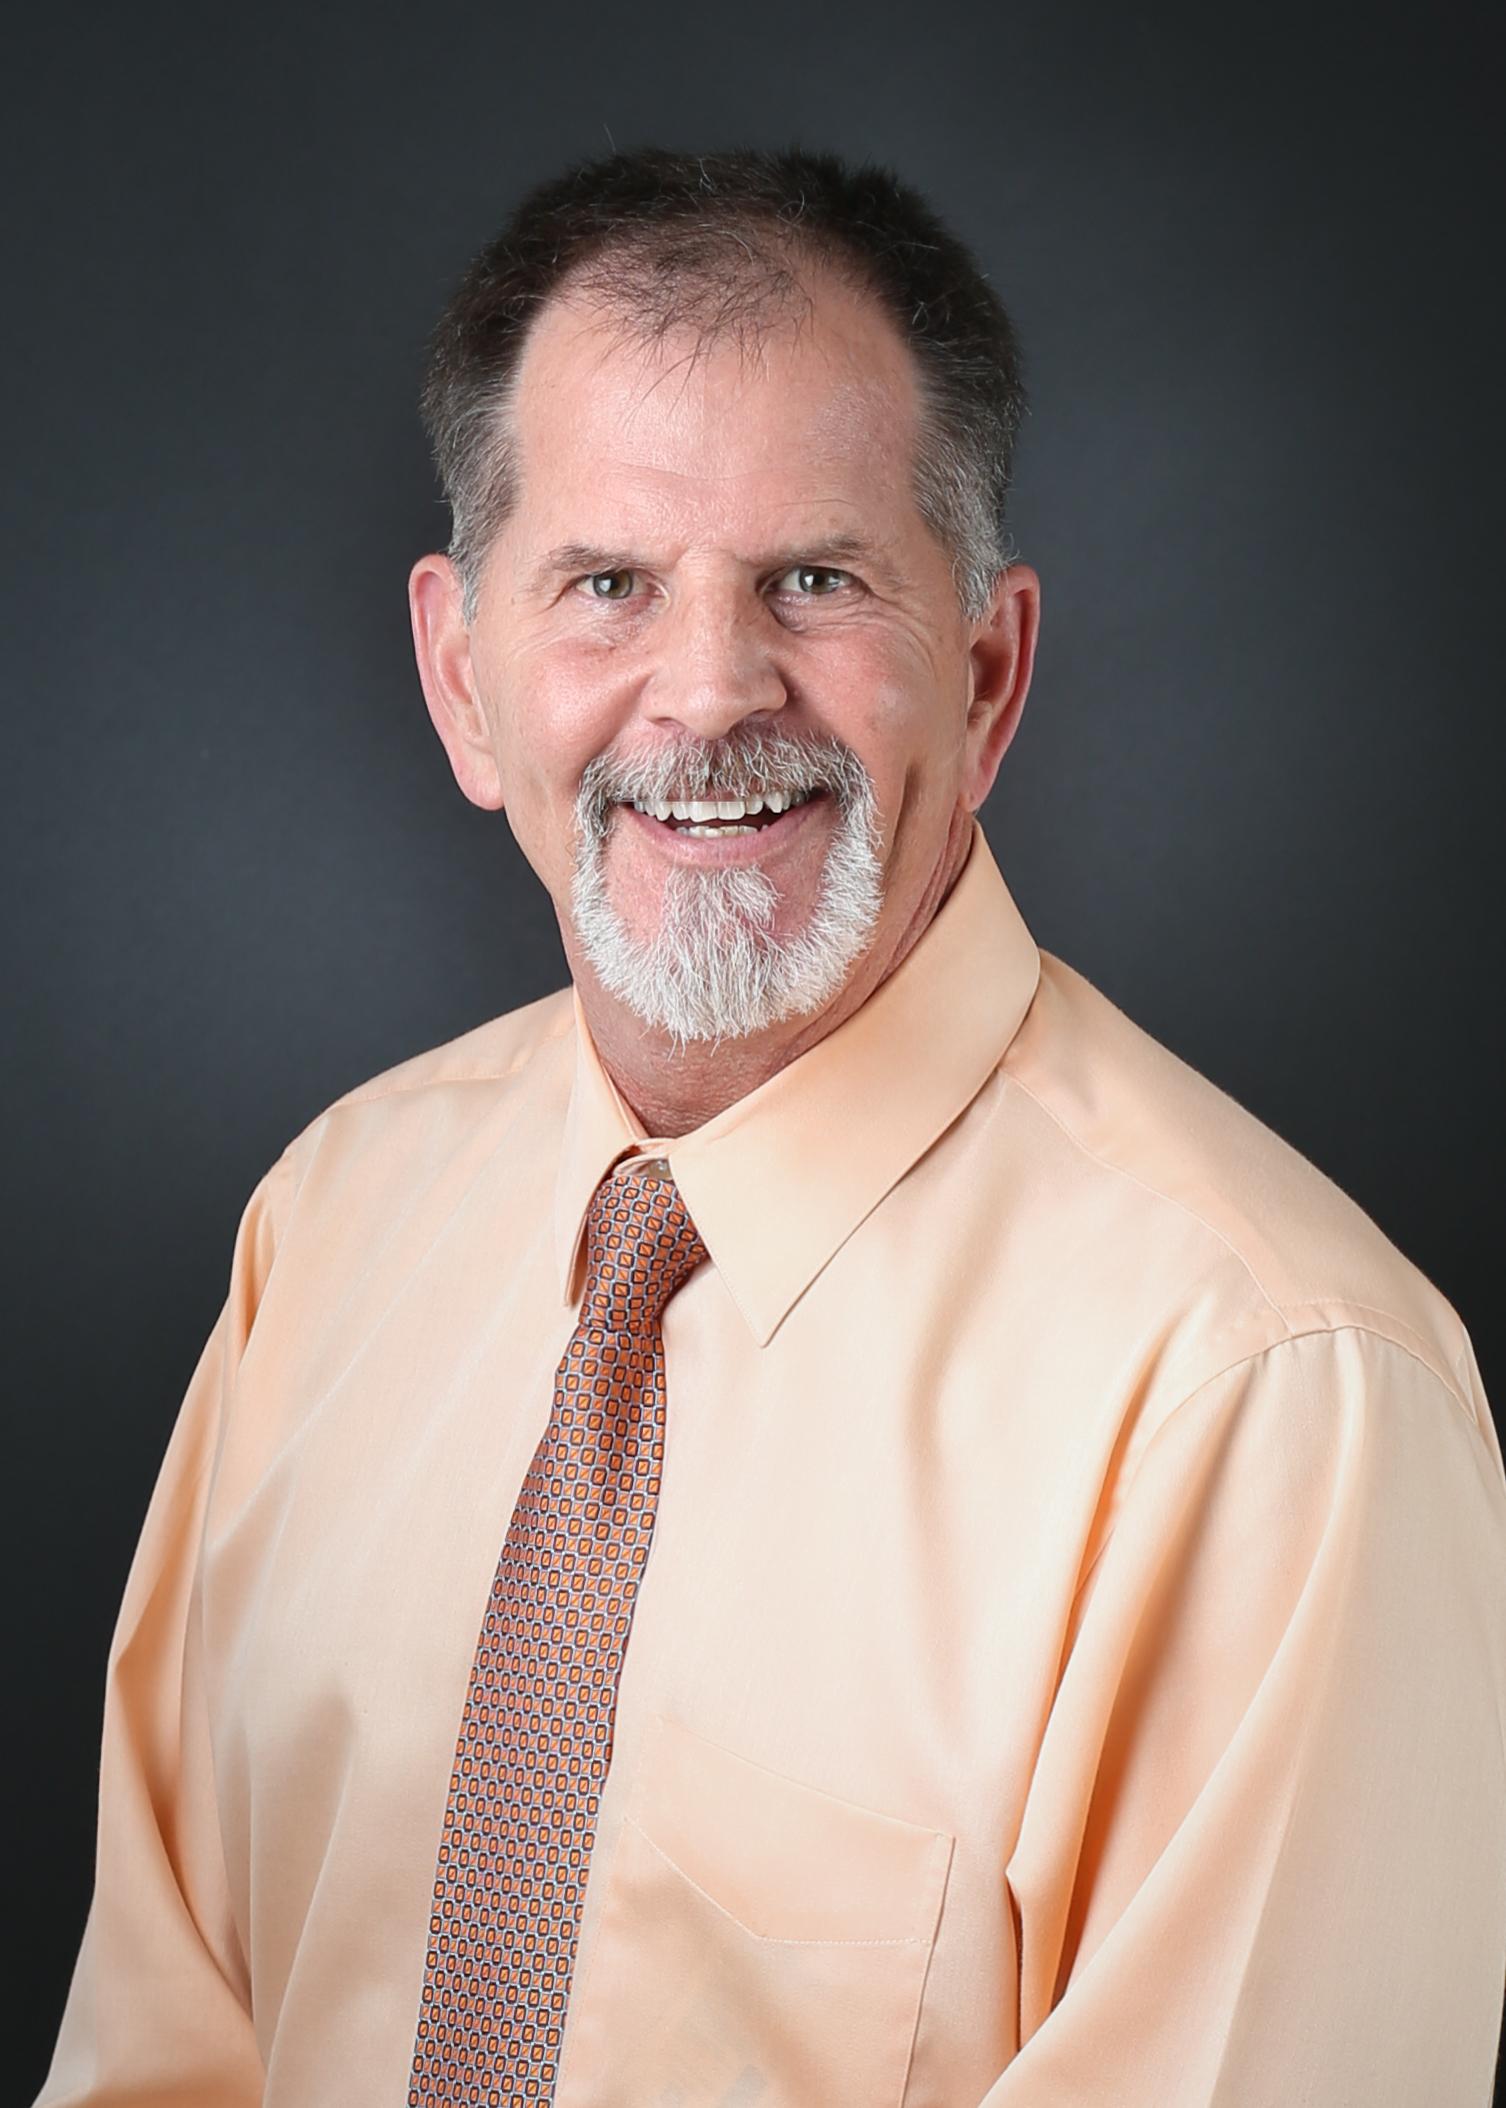 Craig Kopecky, MD